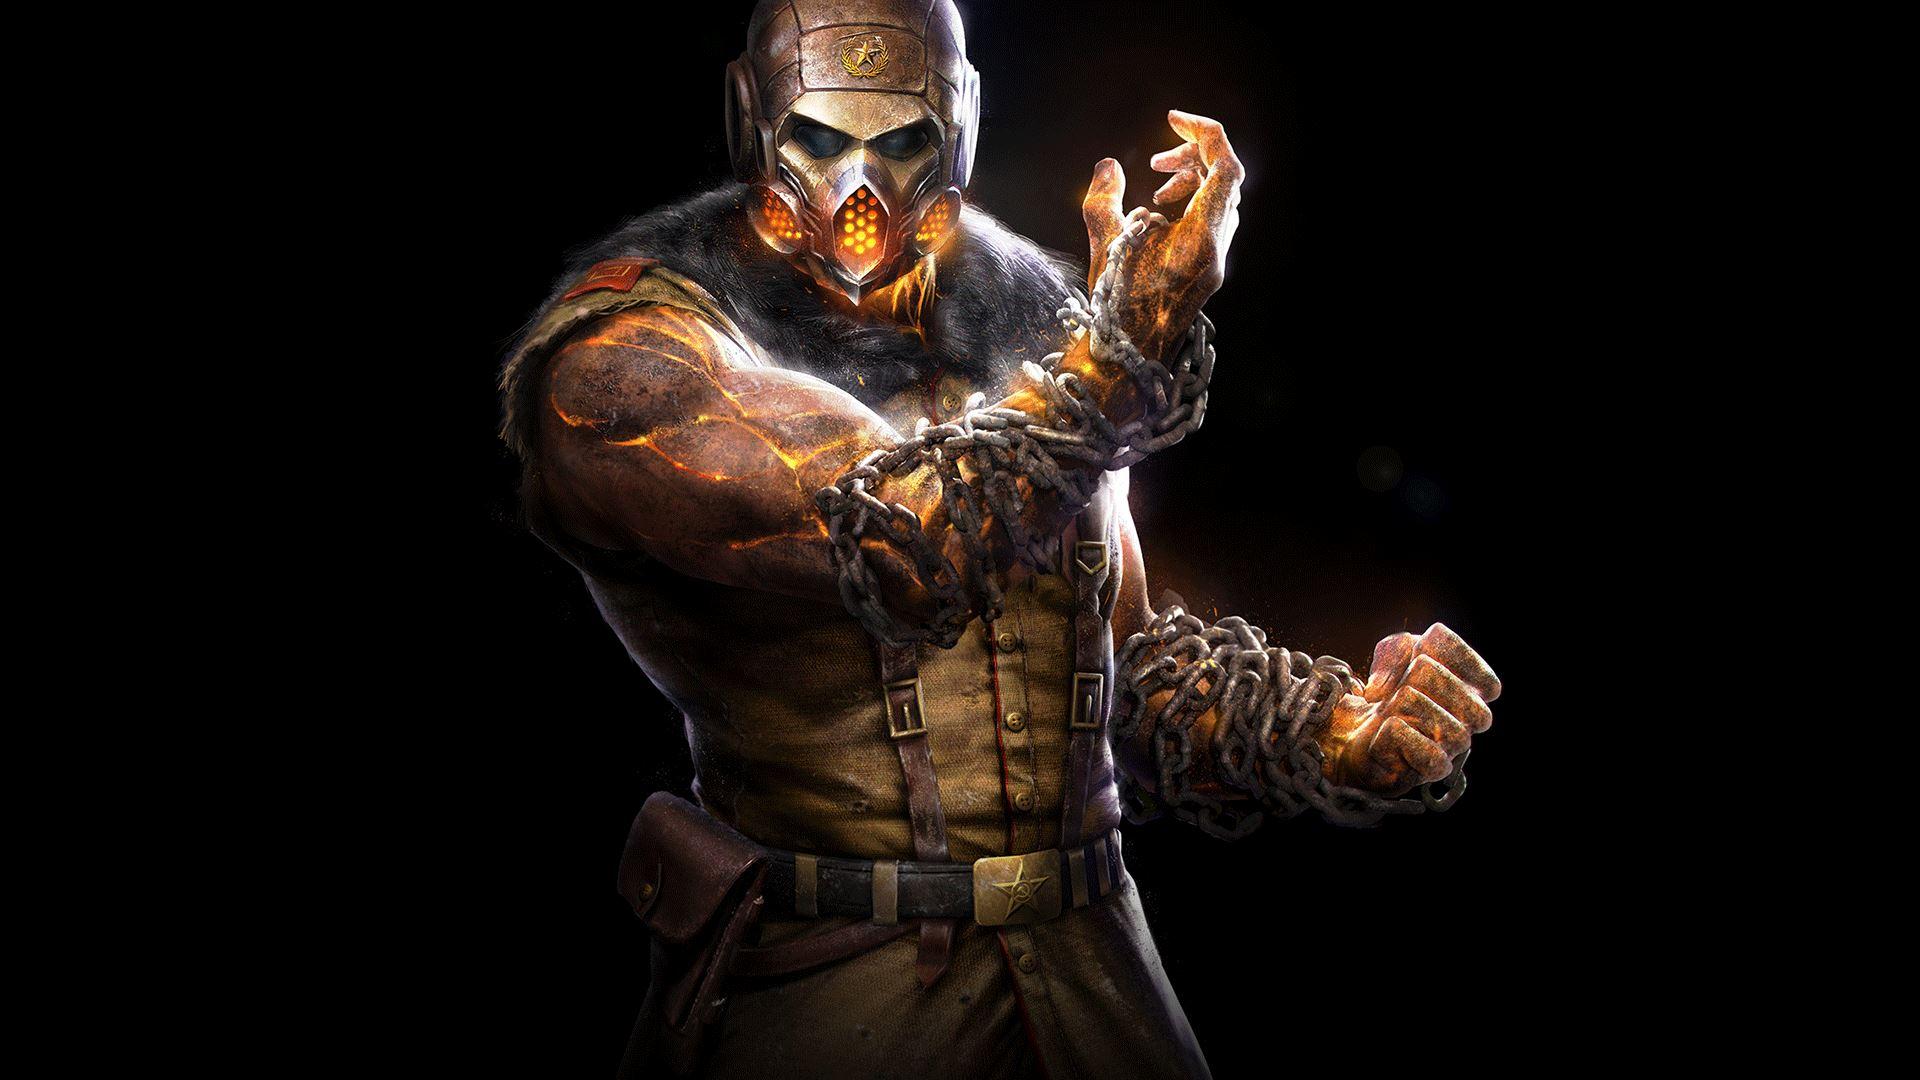 Free Mortal Kombat X Klassic Fatalities And Kold War Scorpion Dlcs